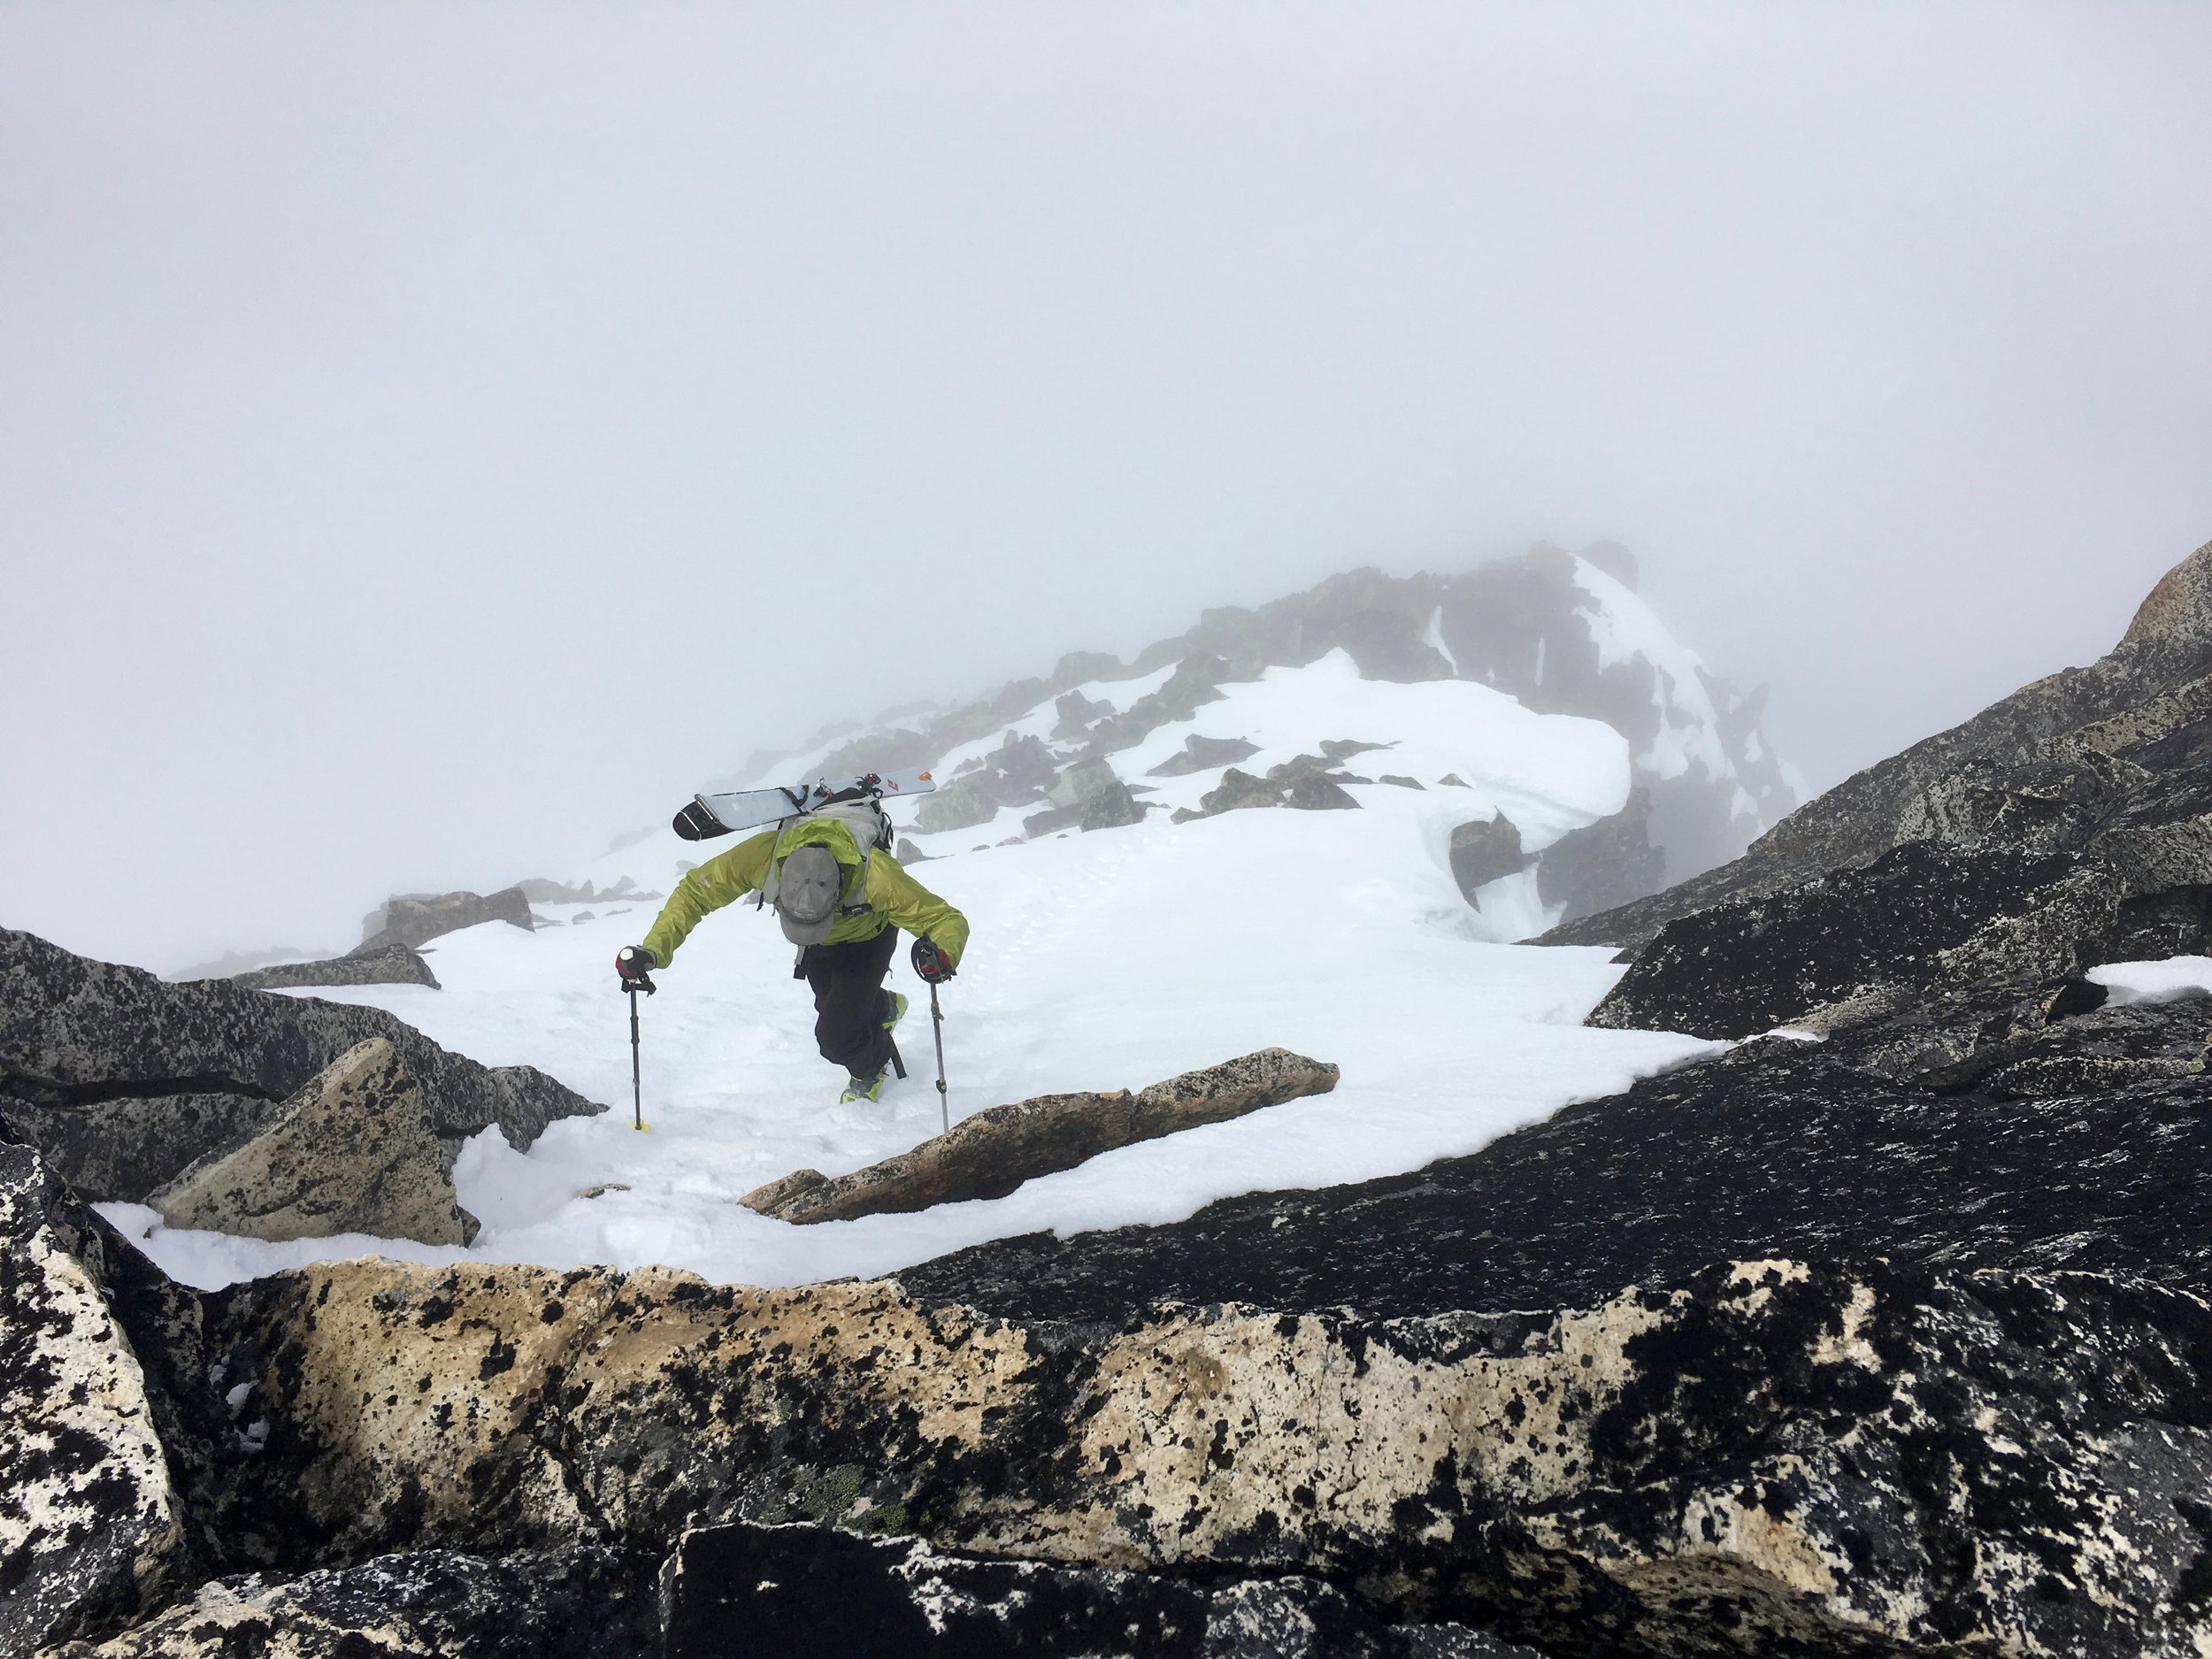 Booting up toward the top